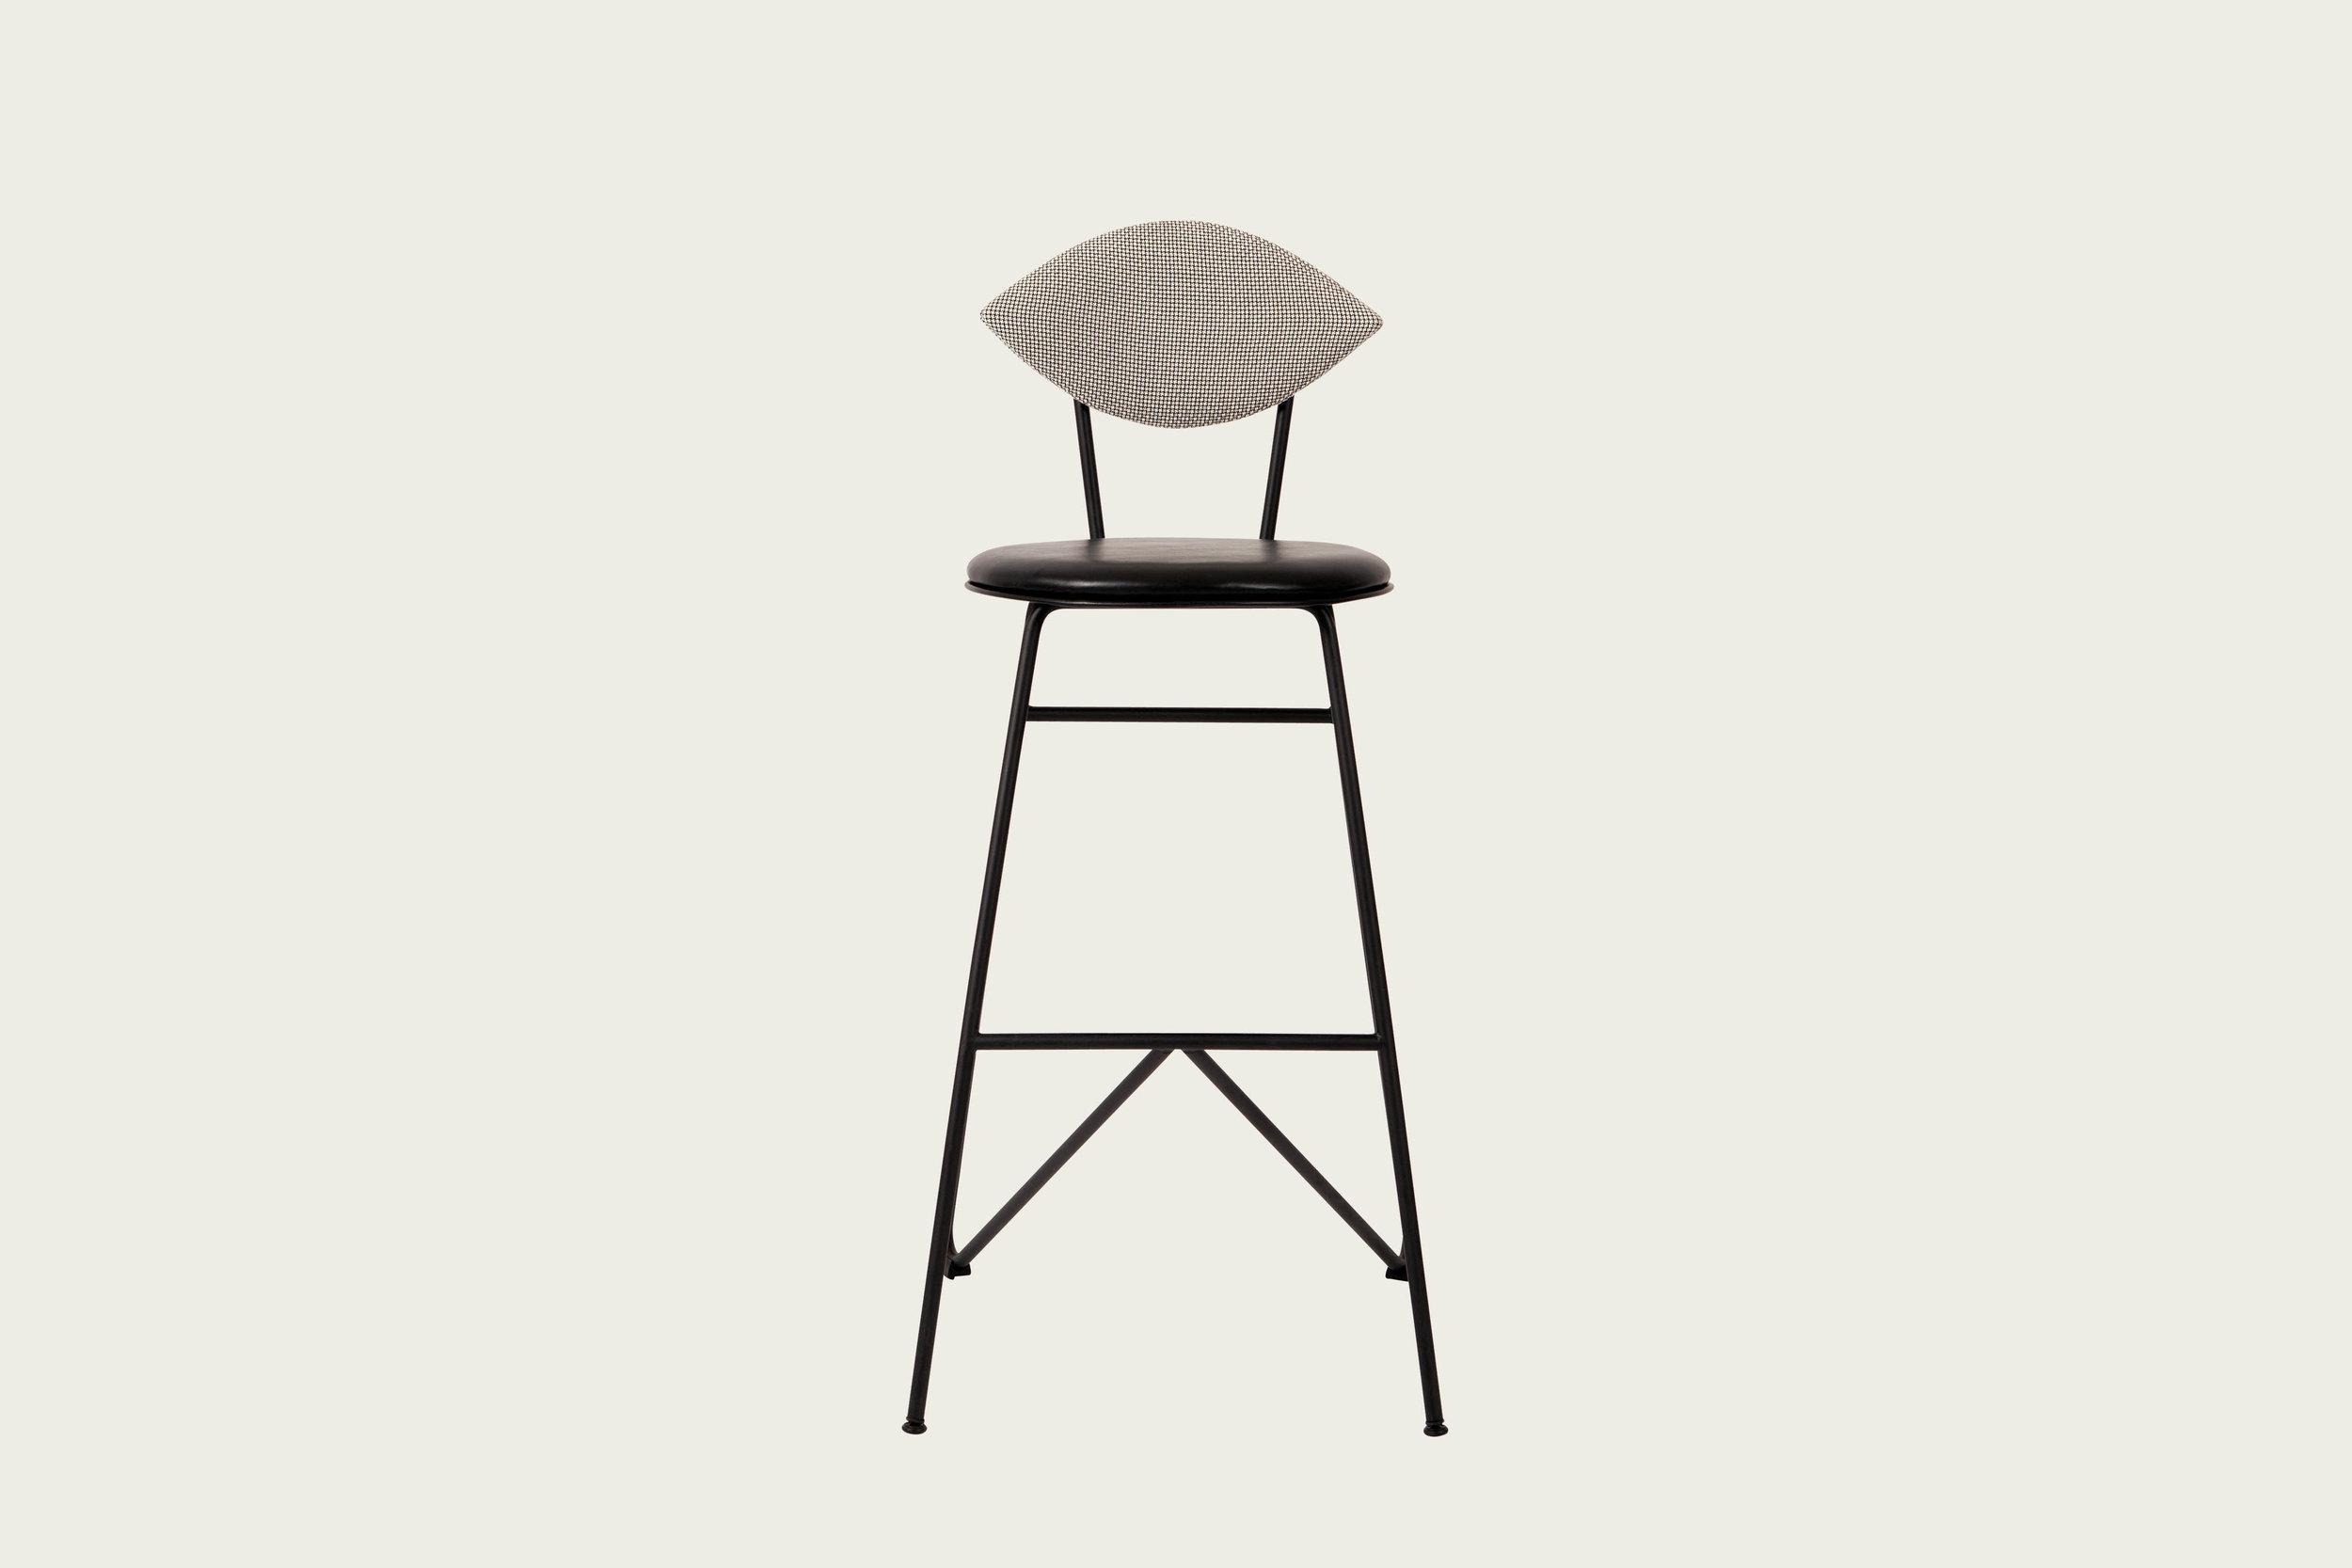 231111_1_AVENUE bar stool_black_fab1_highres kopier.jpg